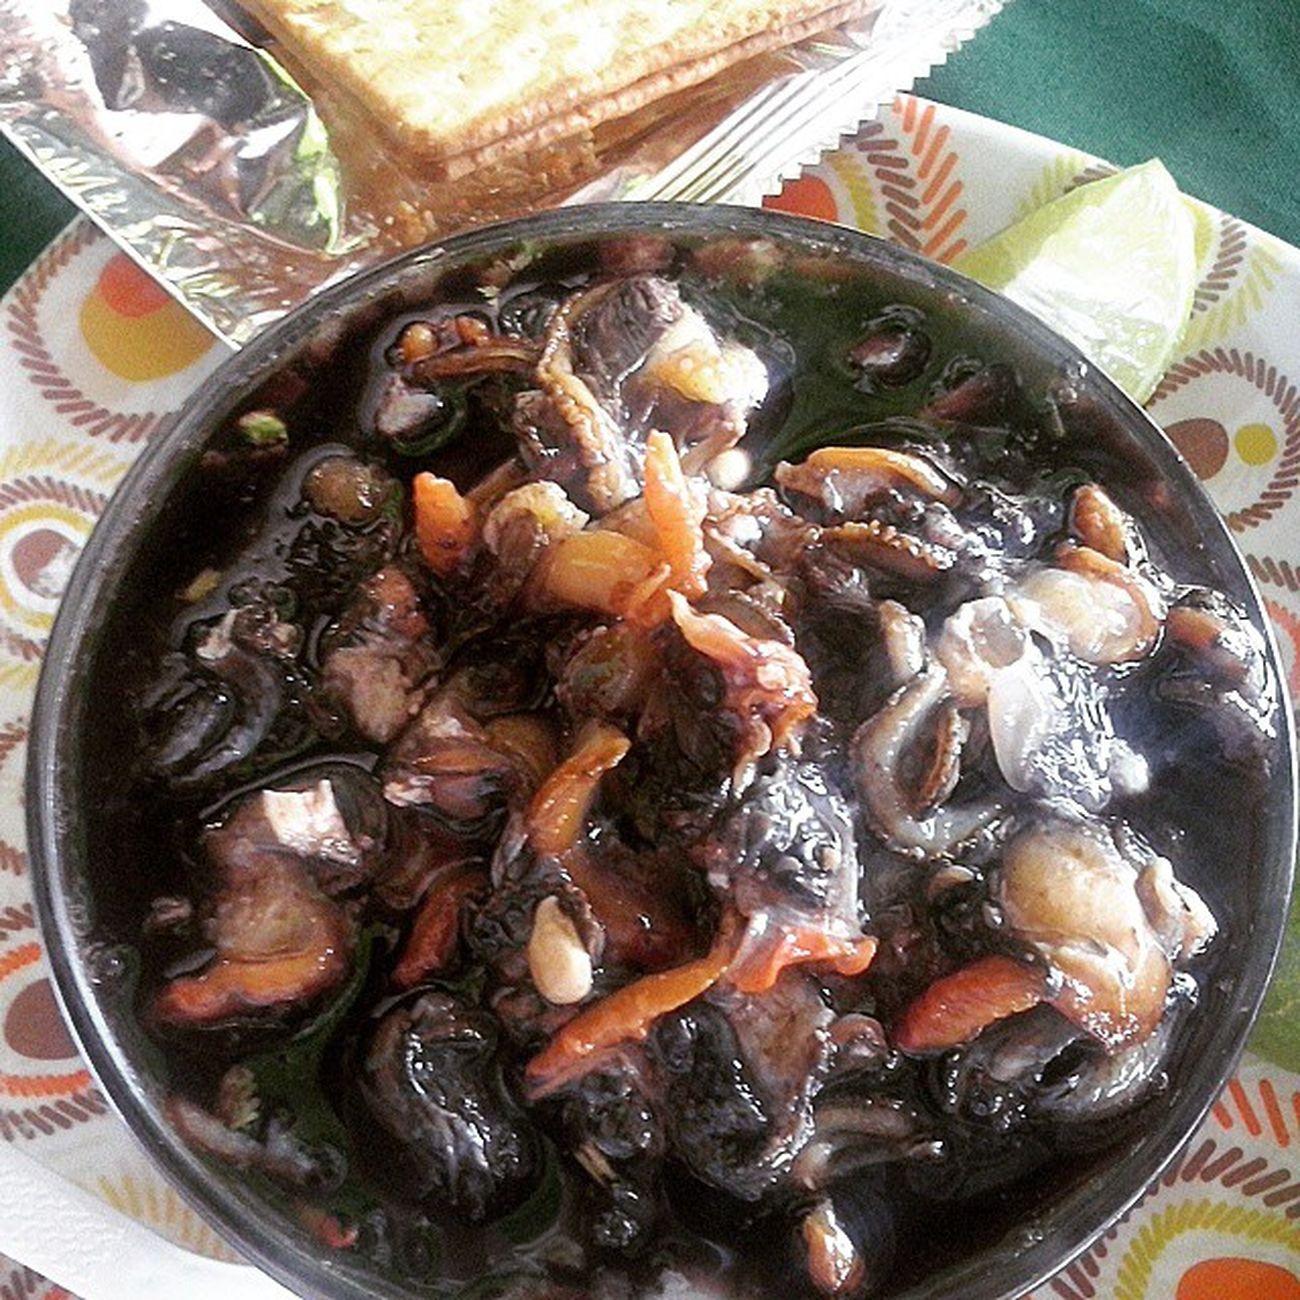 Manjar de dioses Malecon PuertoElTriunfo CoctelDeConchas Misviajes